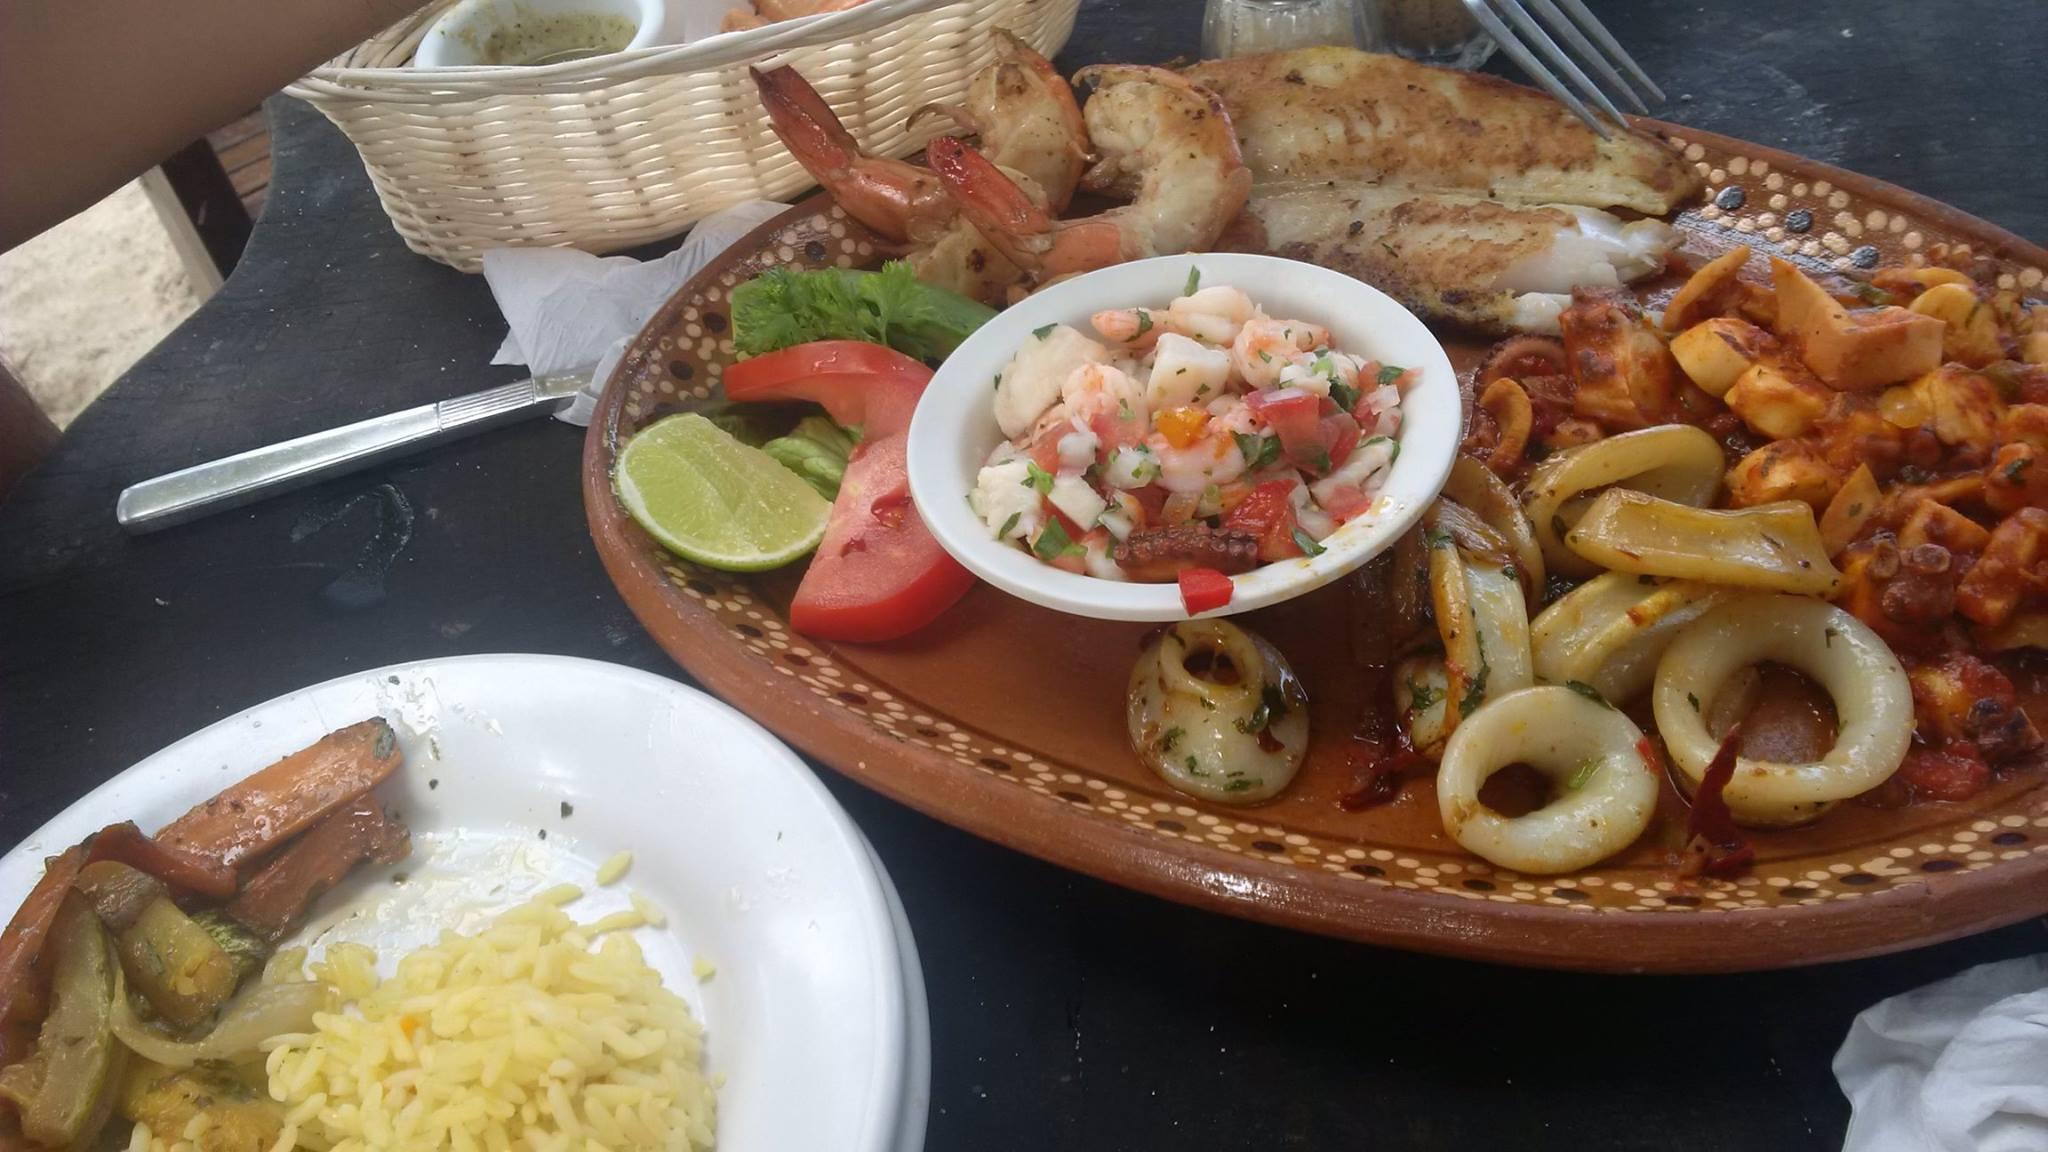 The best food is always fresh from the garden – Sensato Living